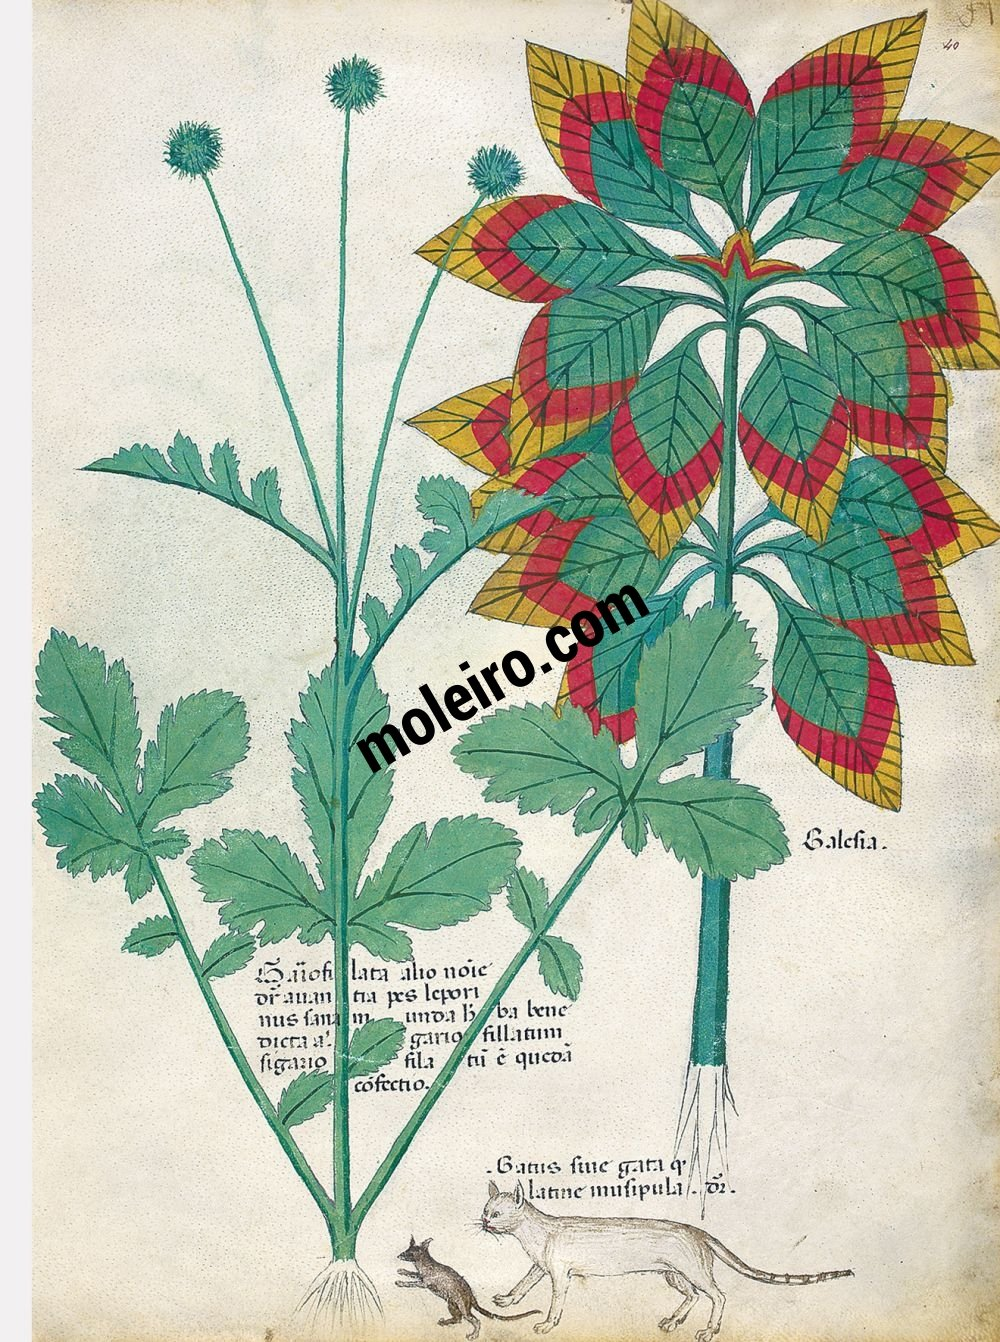 Tractatus de Herbis -Sloane 4016 f. 40r:Joseph's coat; wood avens; cat